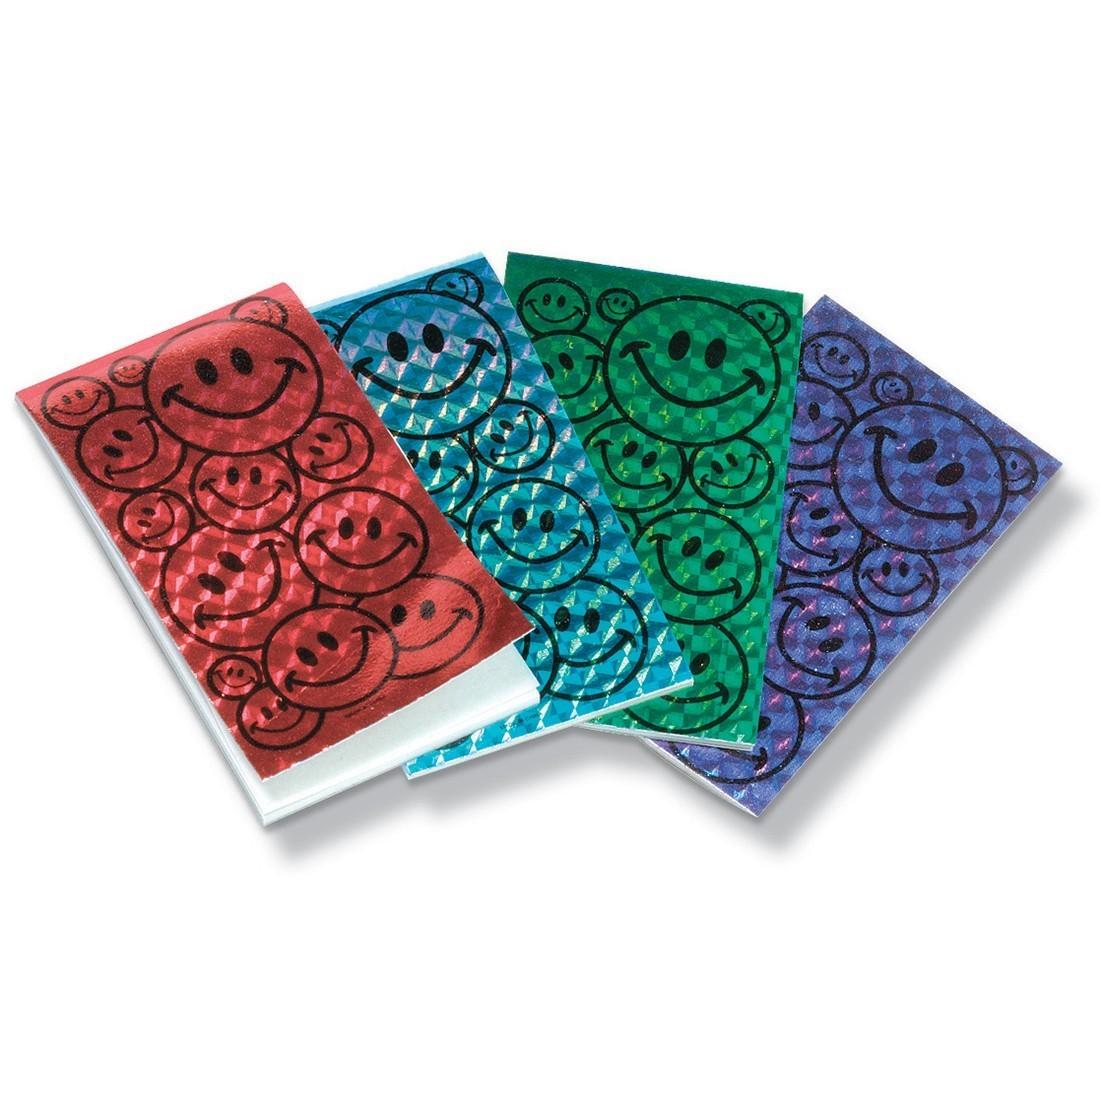 Metallic Smiley Notepads [image]